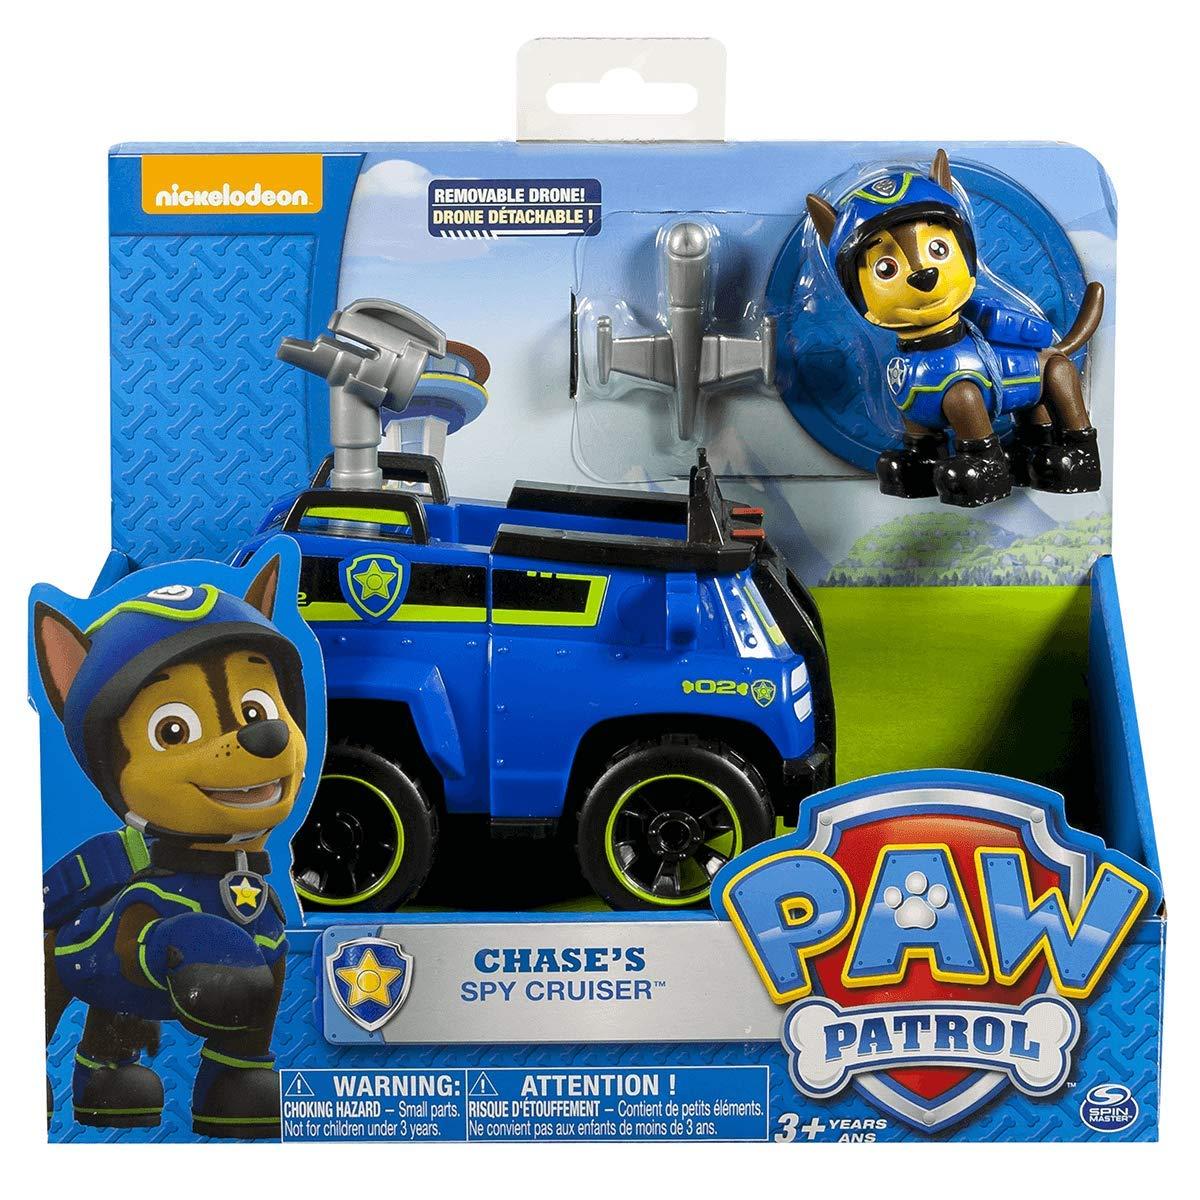 PAW PATROL Action-Figur Fahrzeug Chase /& Spy Cruiser